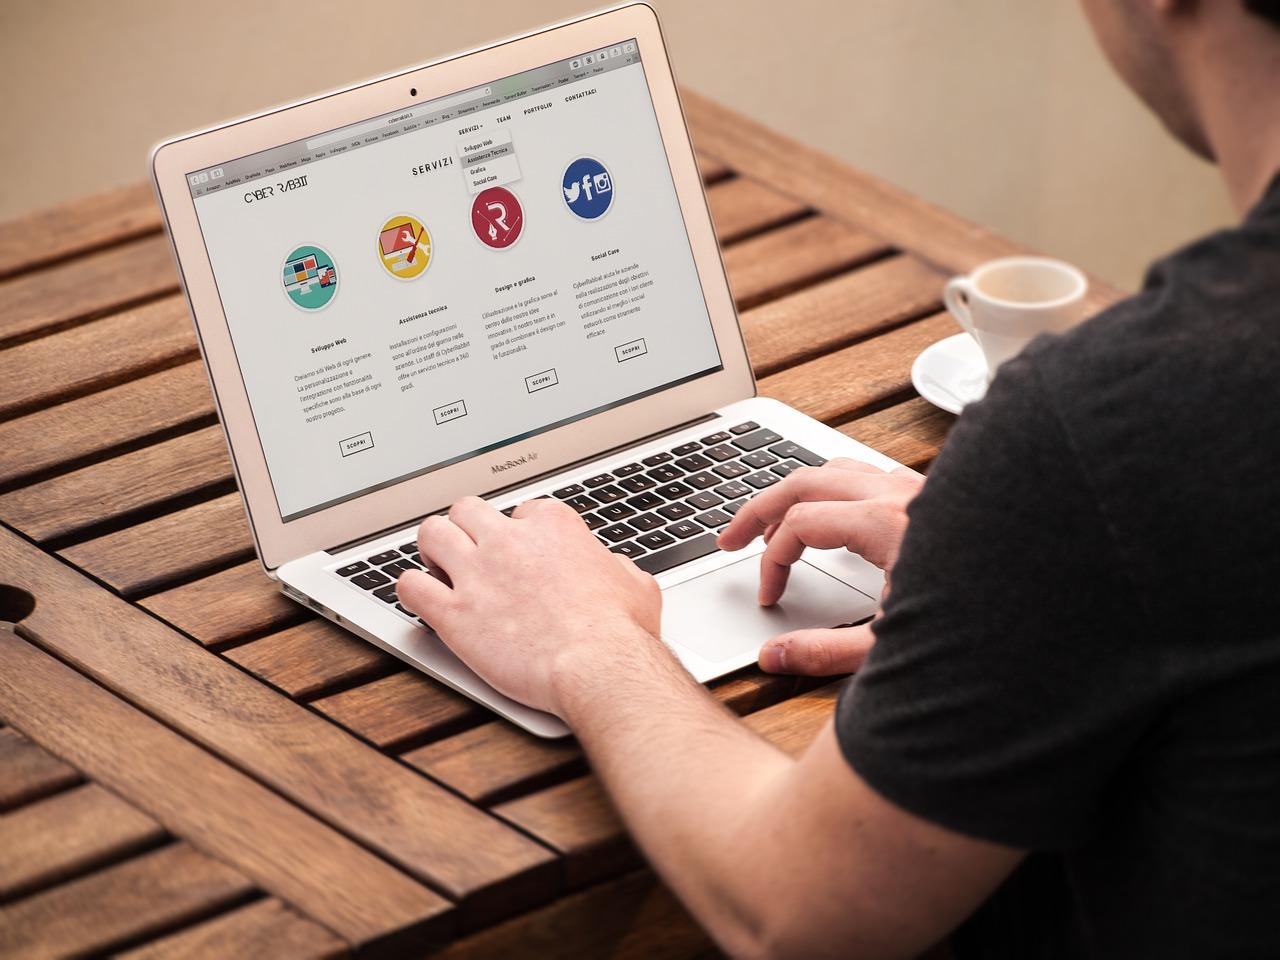 a-man-visiting-a-website-on-a-laptop